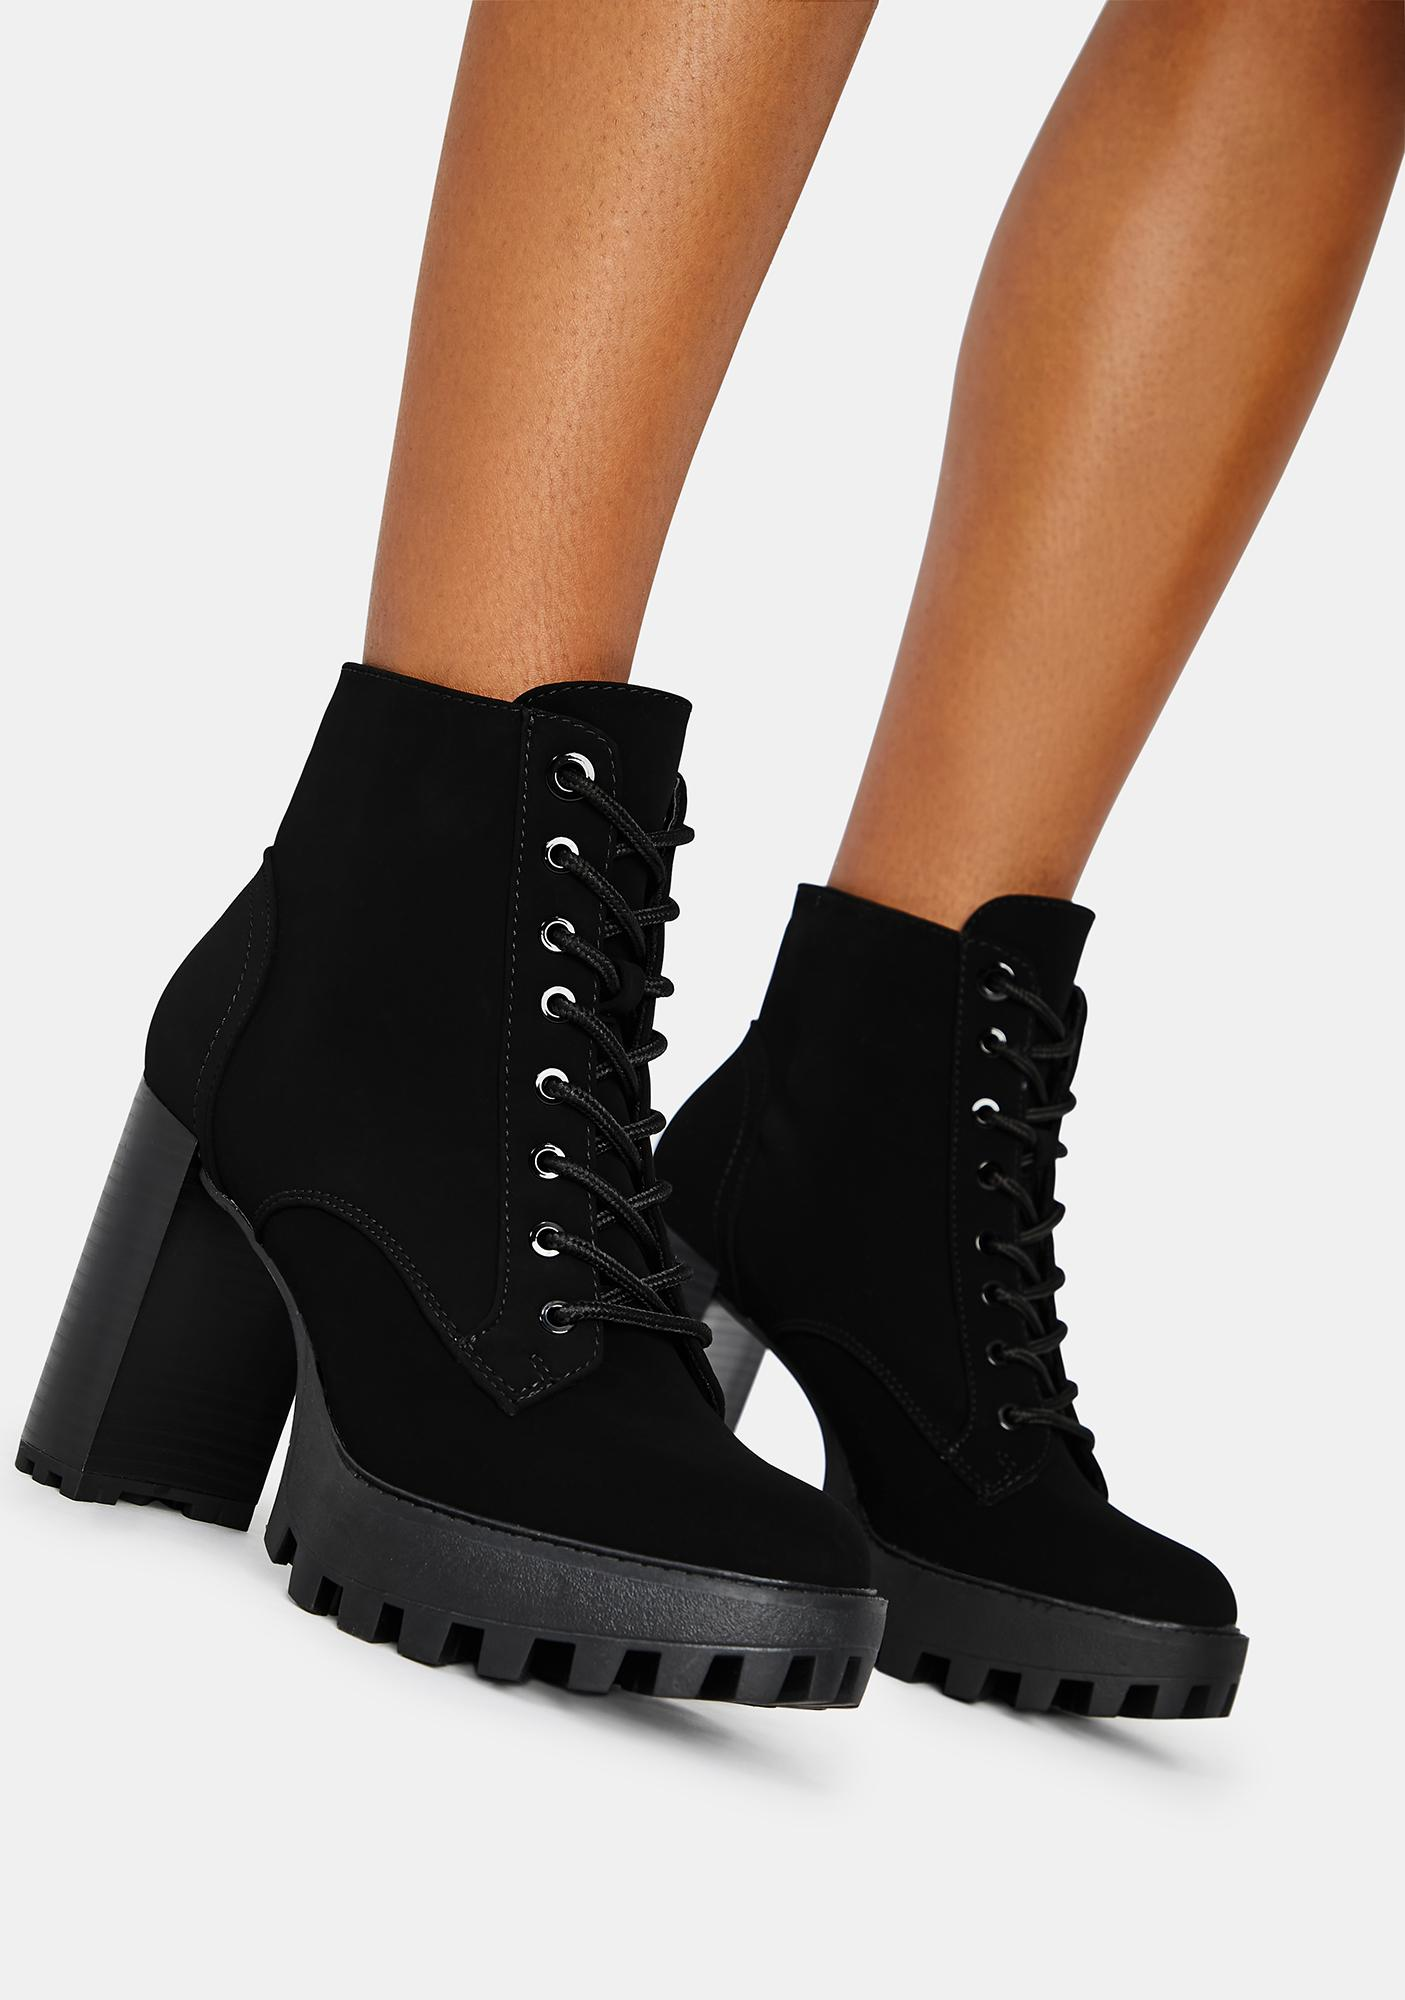 Lace Up Heeled Platform Booties - Black